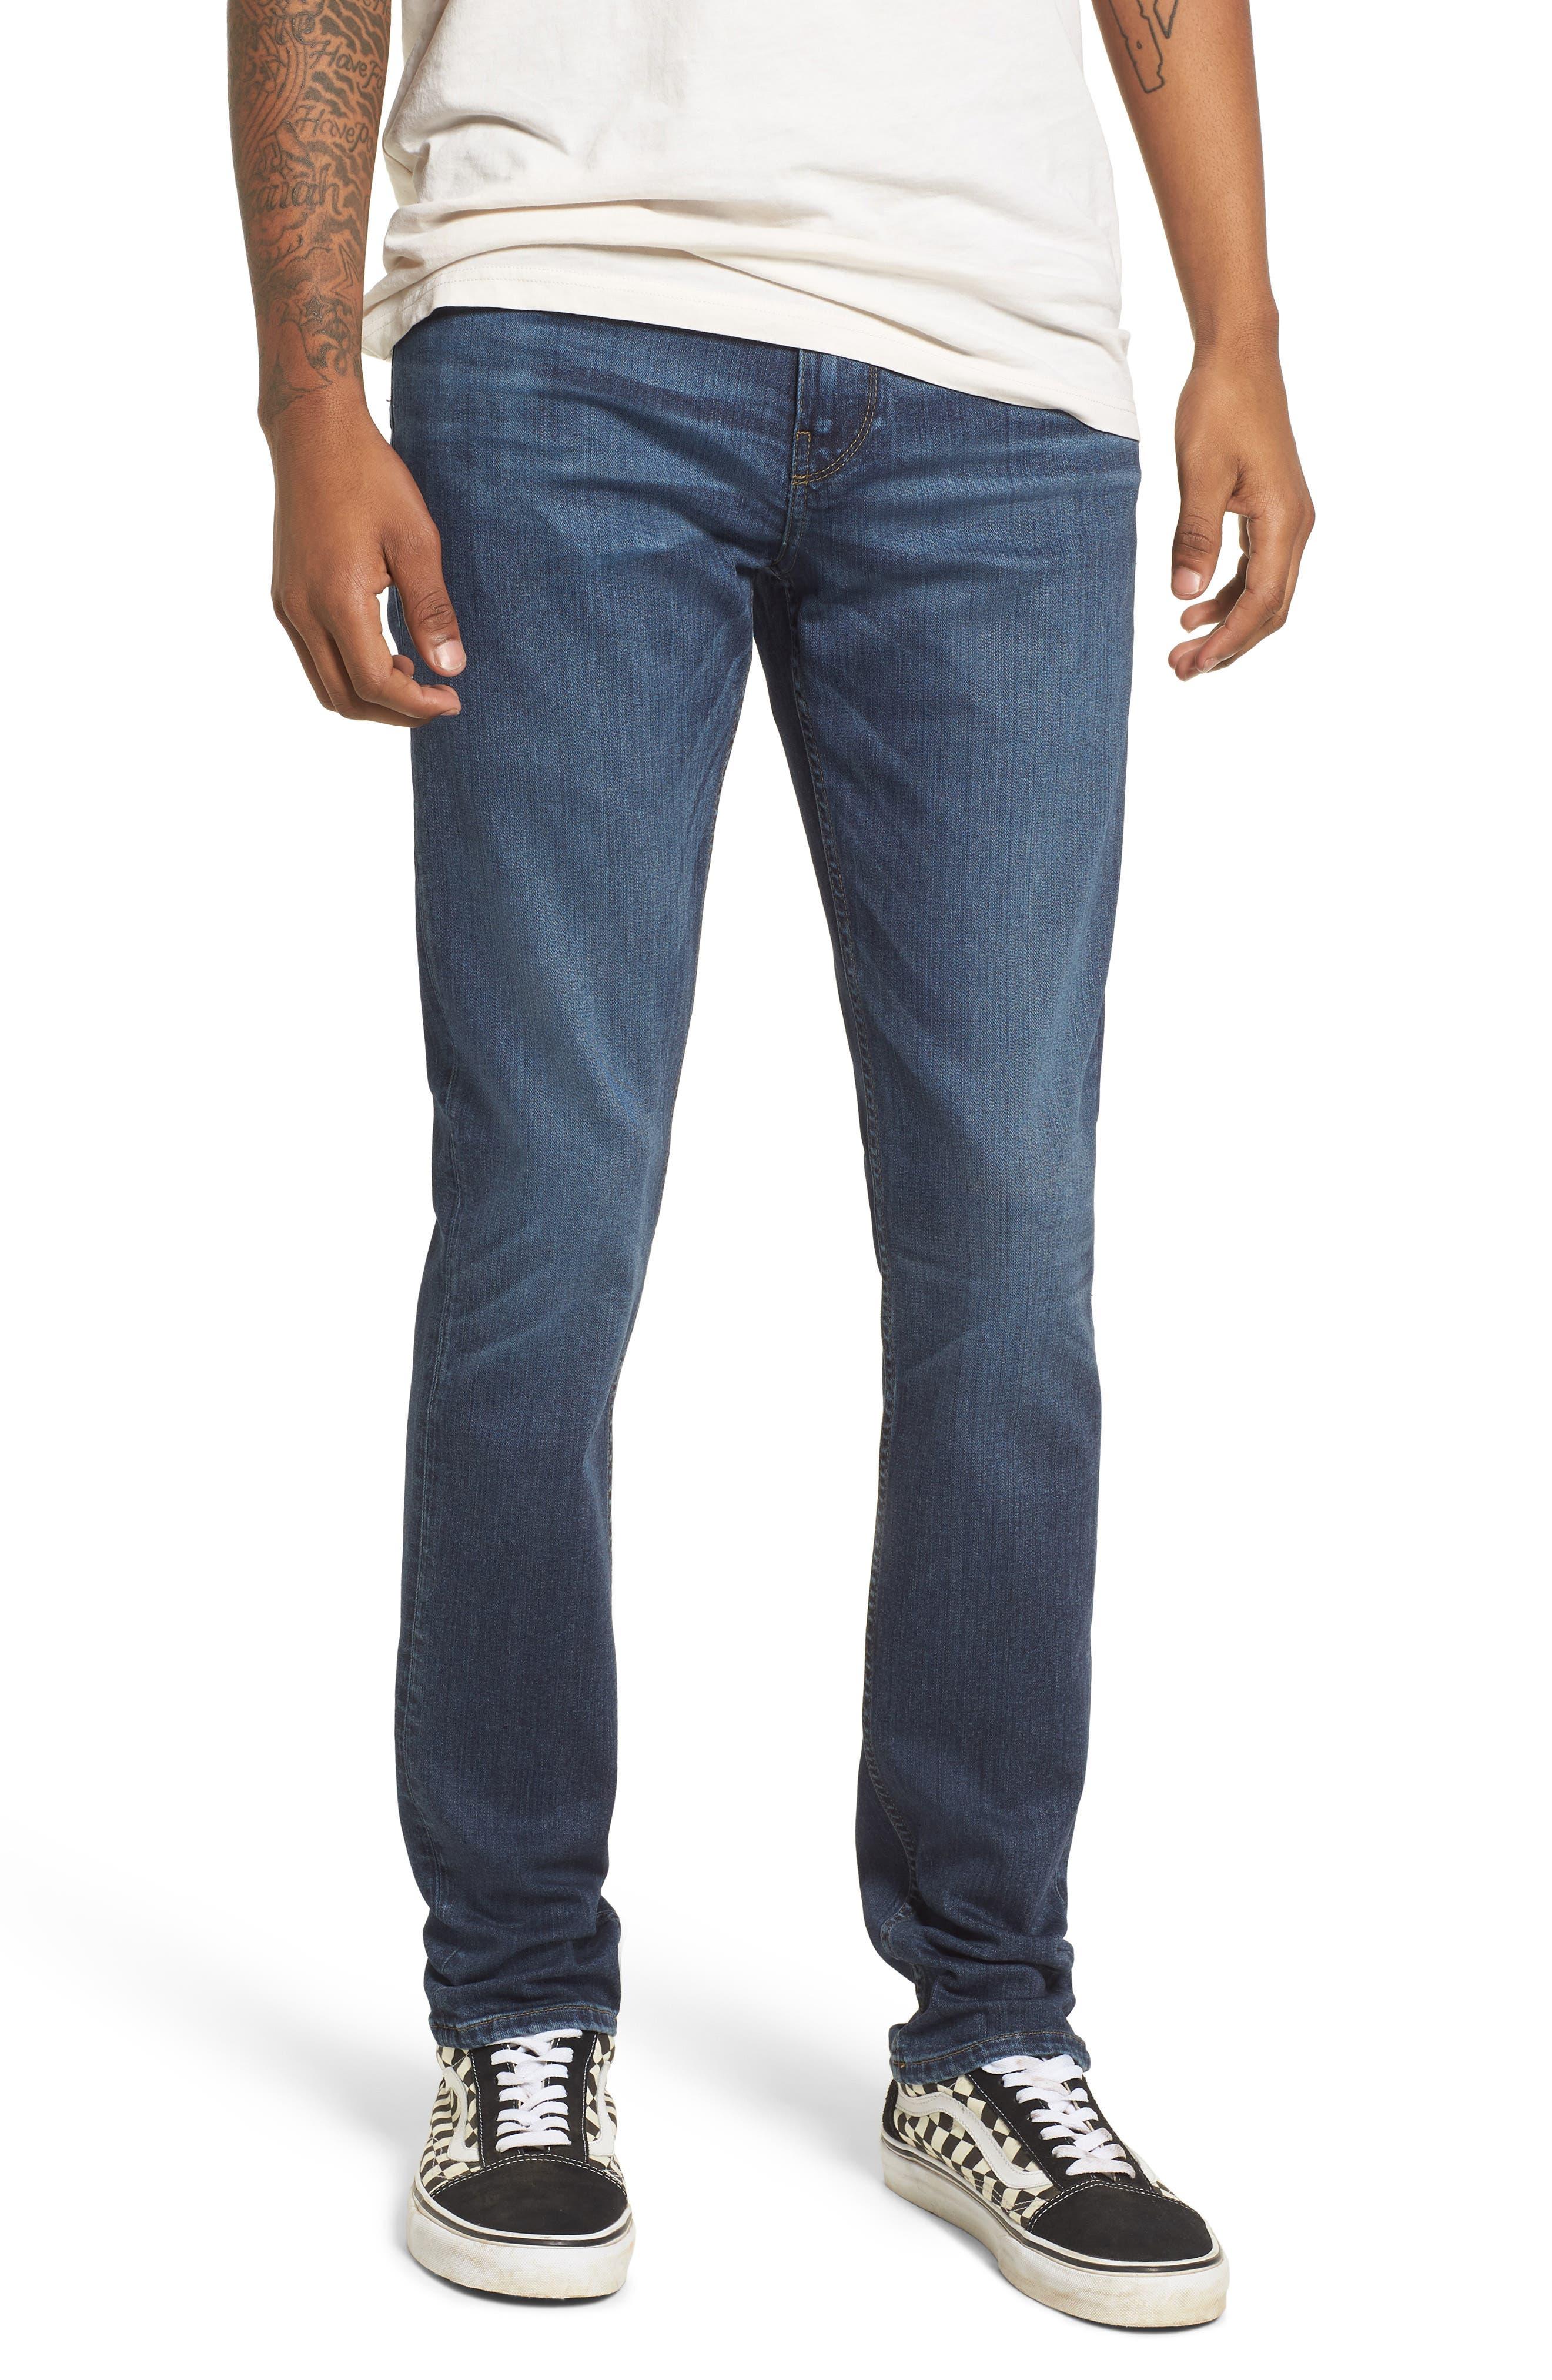 PAIGE Transcend - Croft Skinny Fit Jeans (Fulton) (Nordstrom Exclusive)